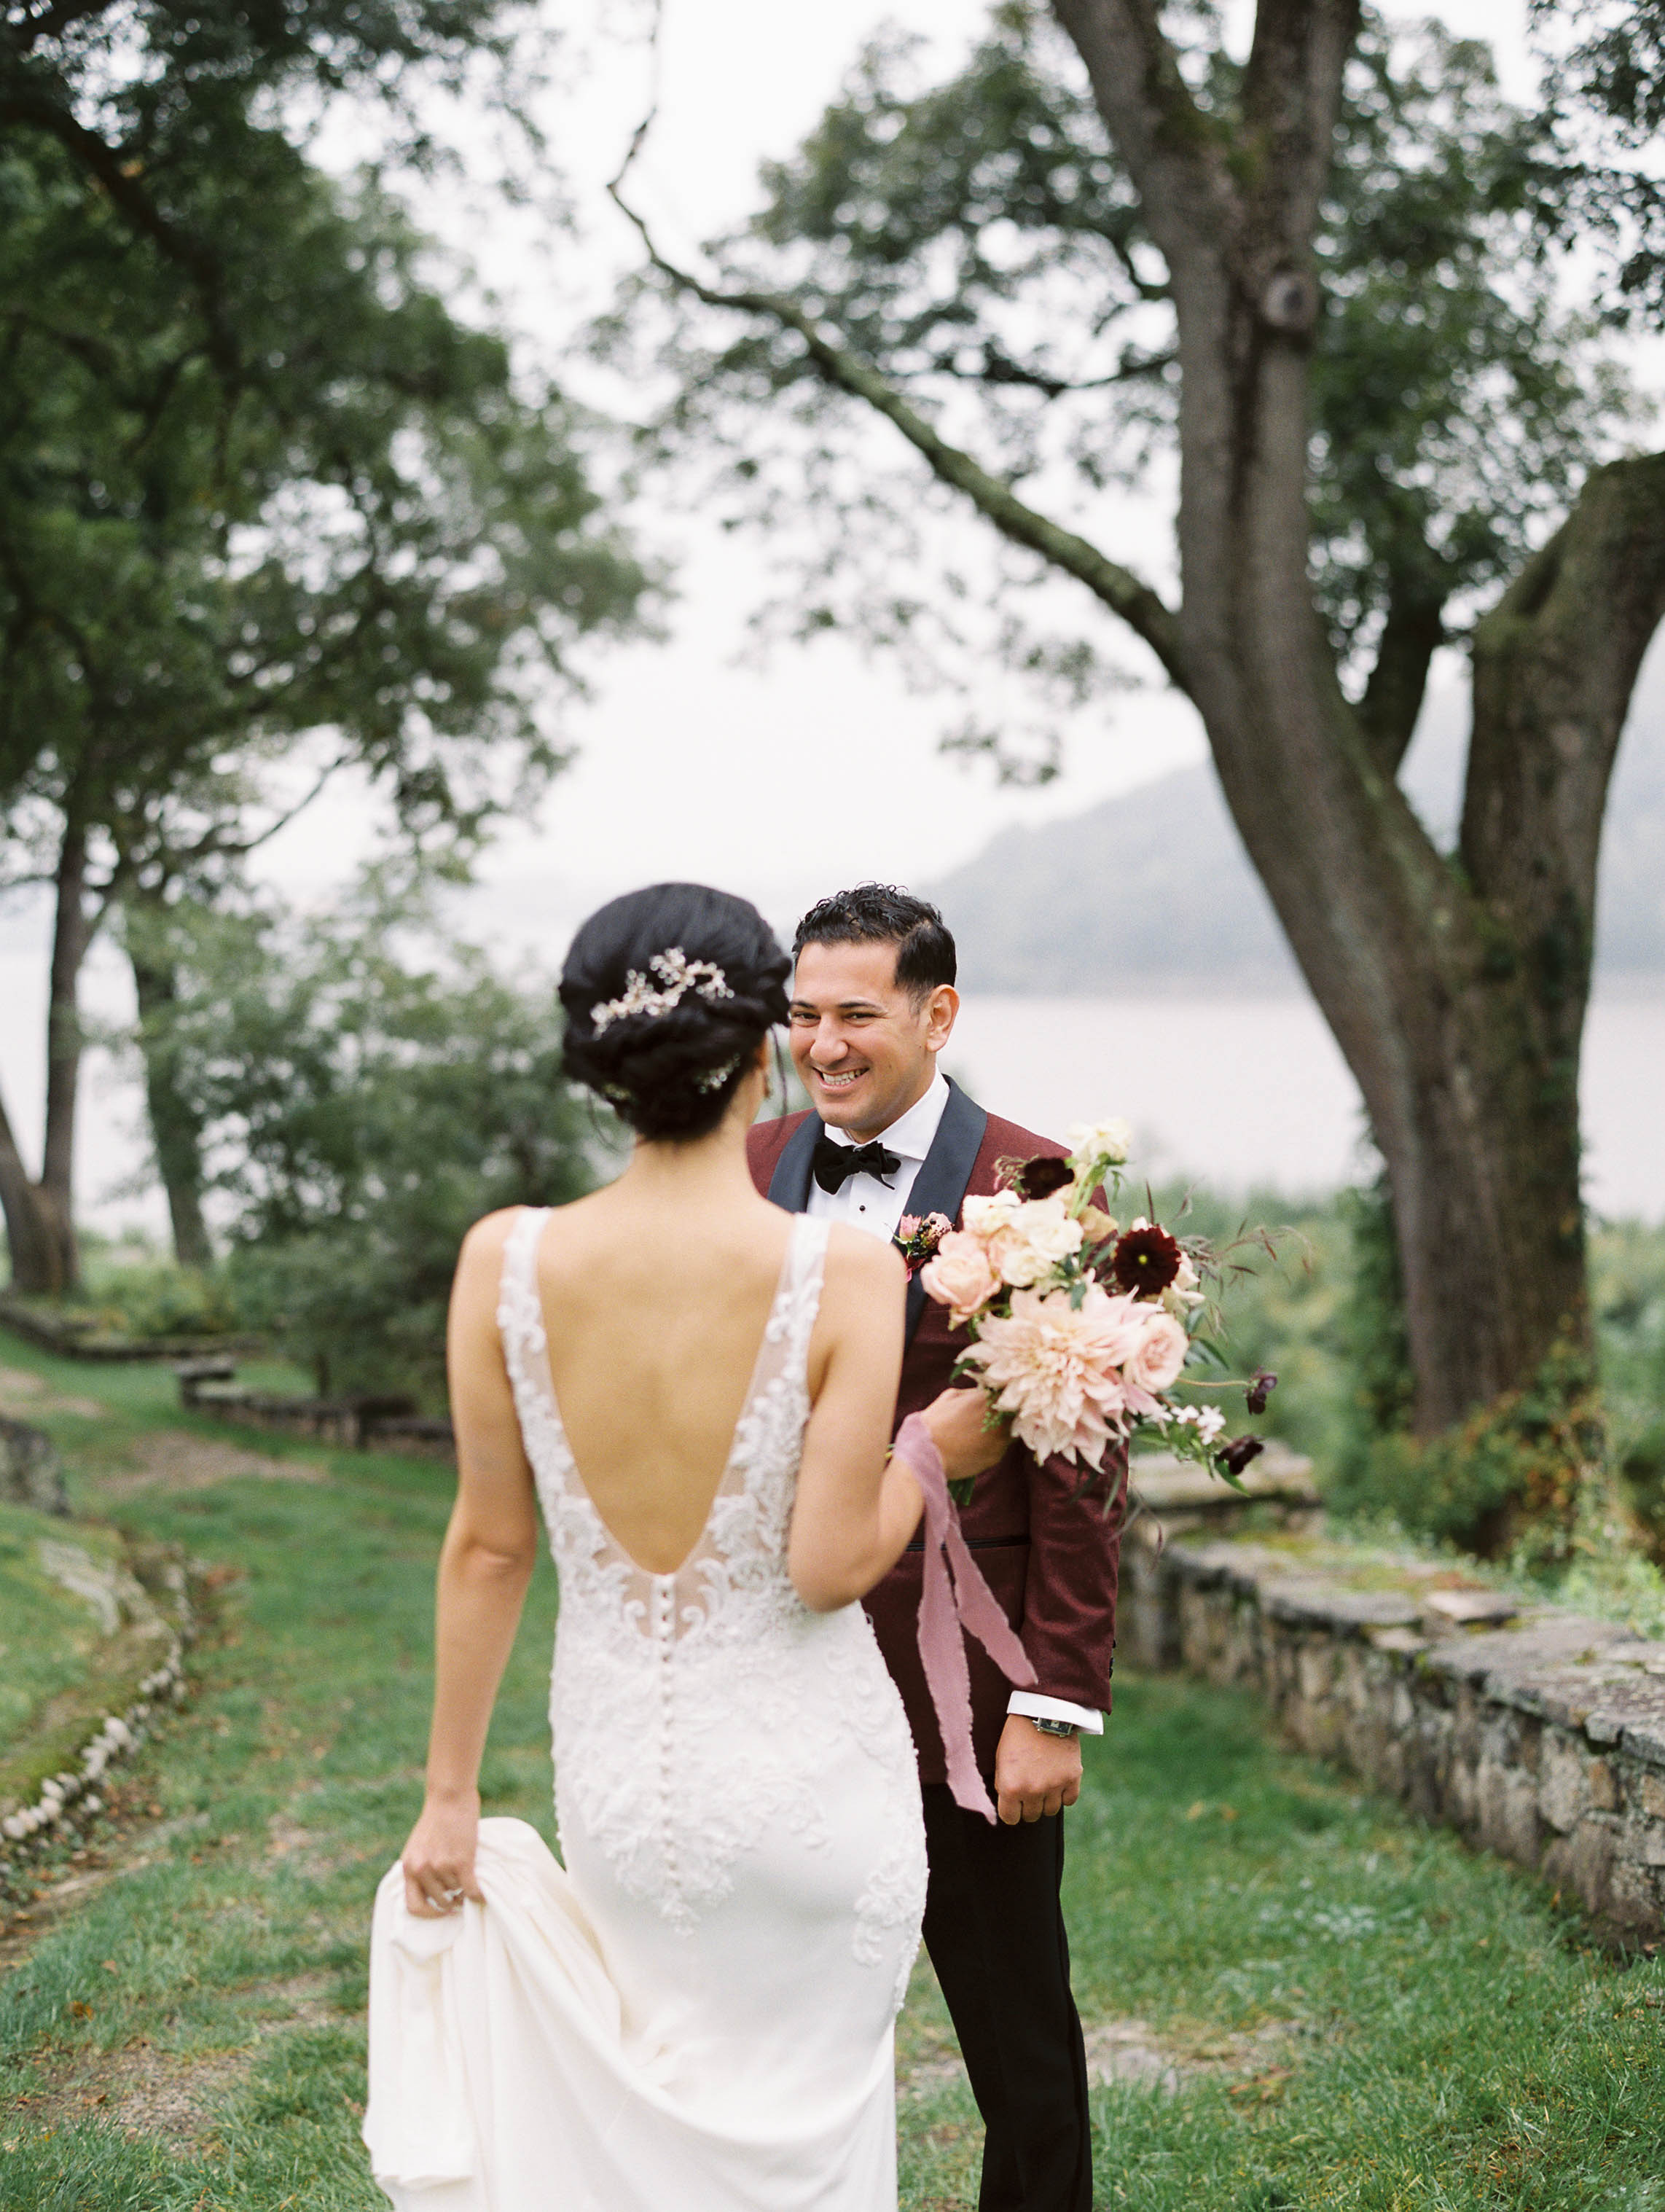 kelsandmichael_weddingphotography_ny-17.jpg